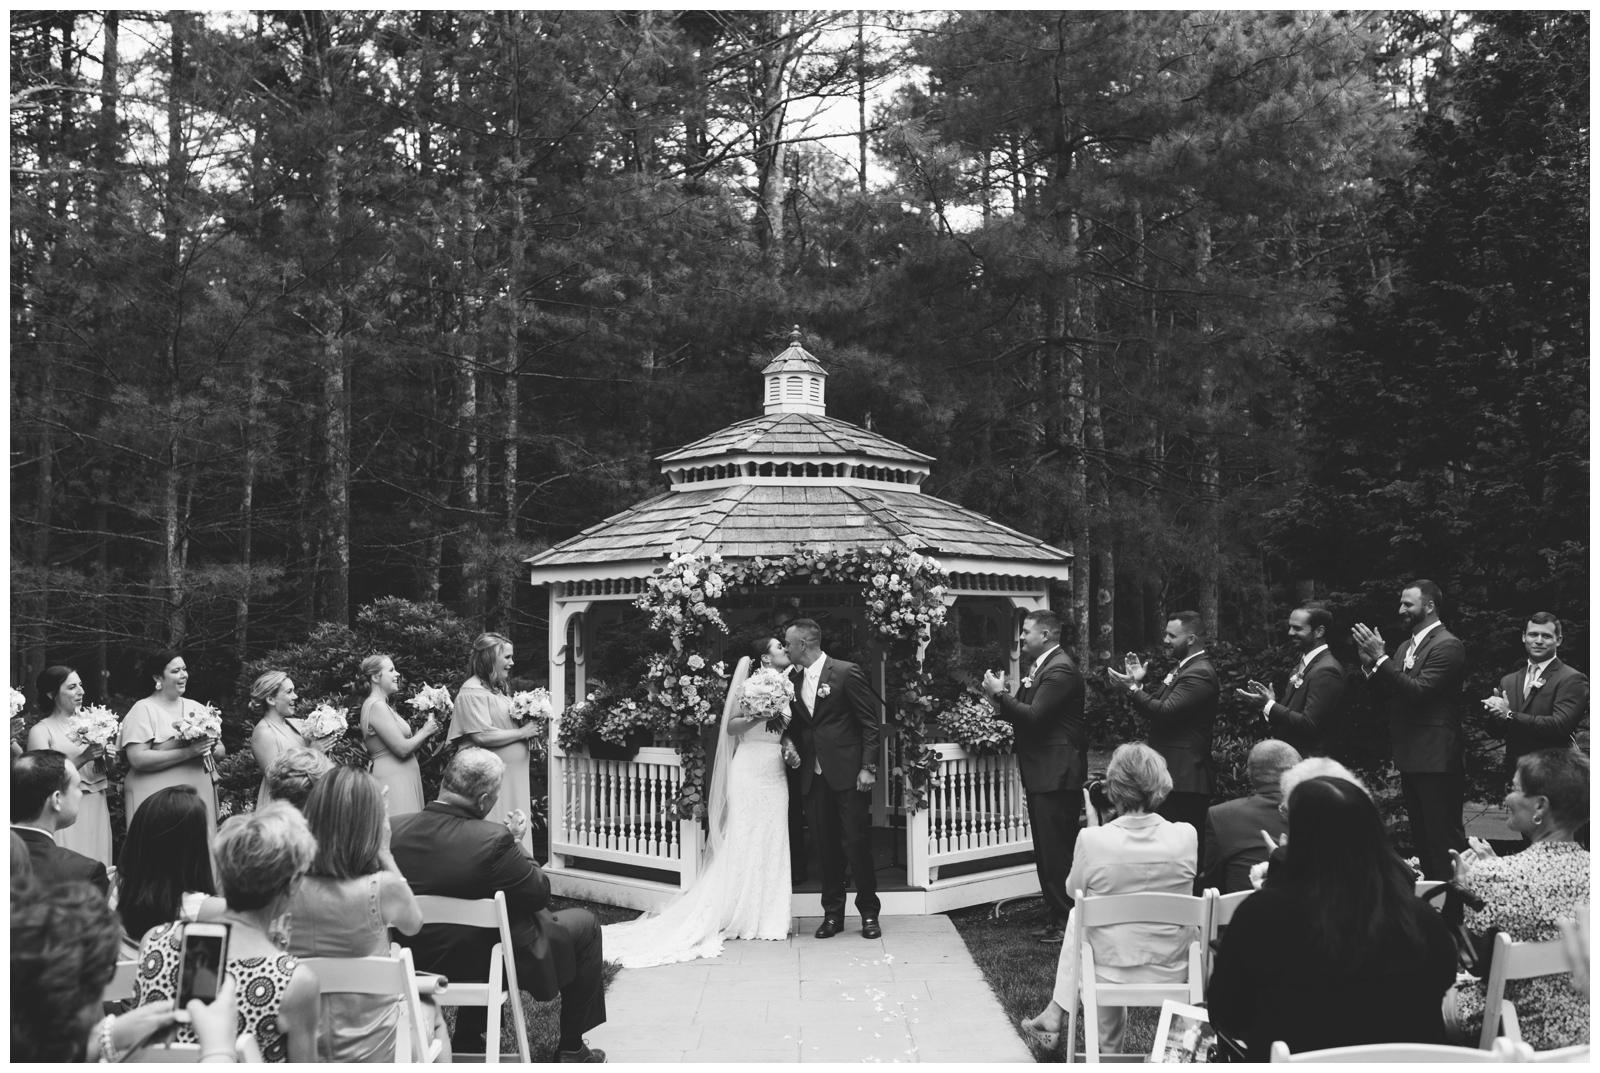 Bailey-Q-Photo-Pine-Hills-Pavilion-Wedding-Boston-Wedding-Photographer-071.jpg